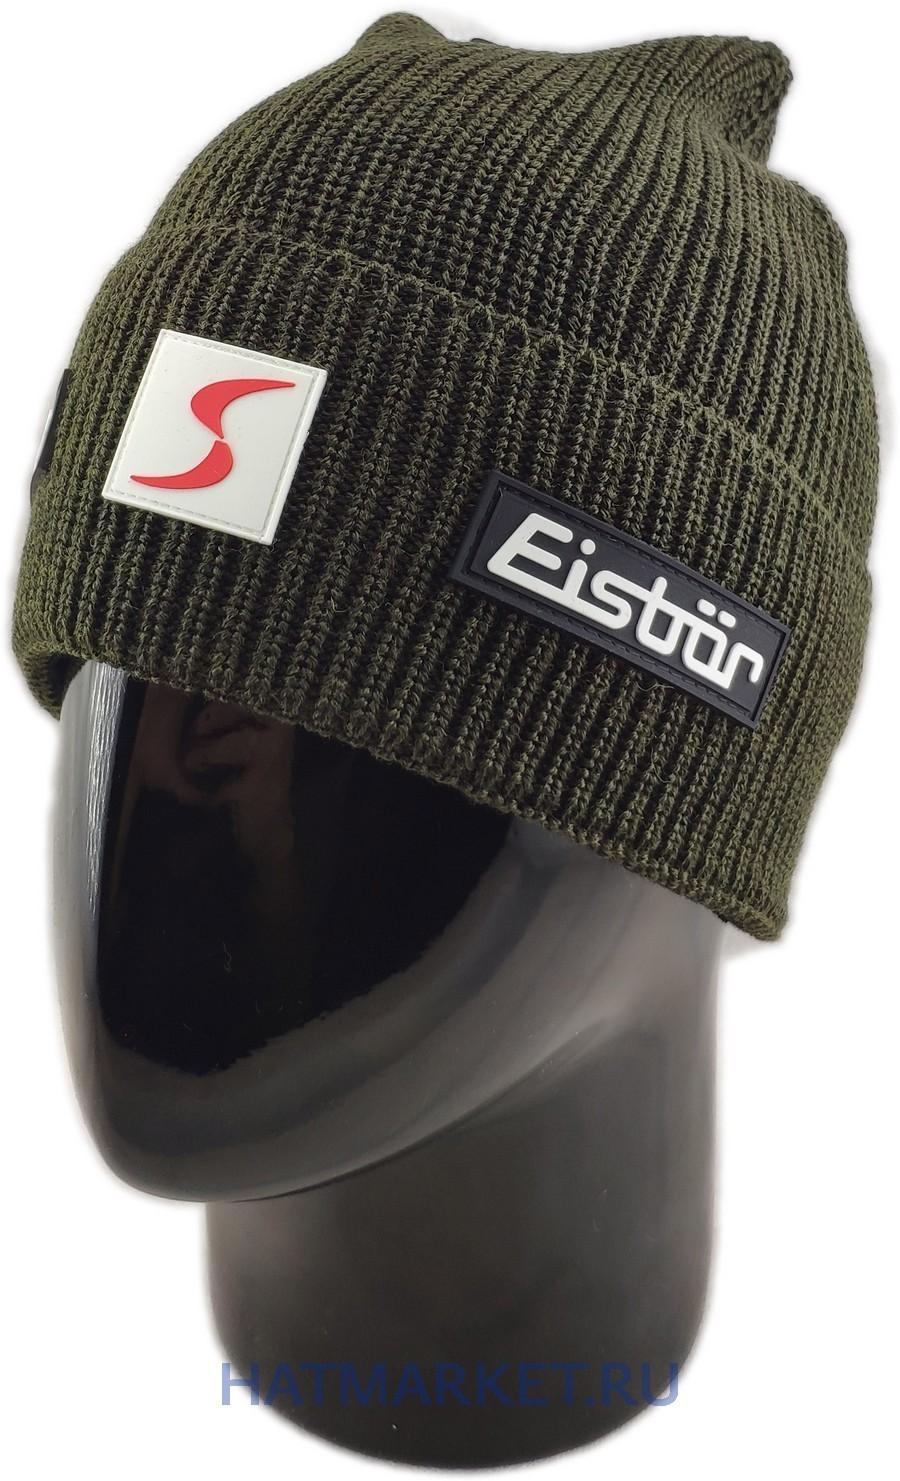 Шапки средней вязки Шапка Eisbar Bent OS SP 659 IMG_20190920_105839.jpg